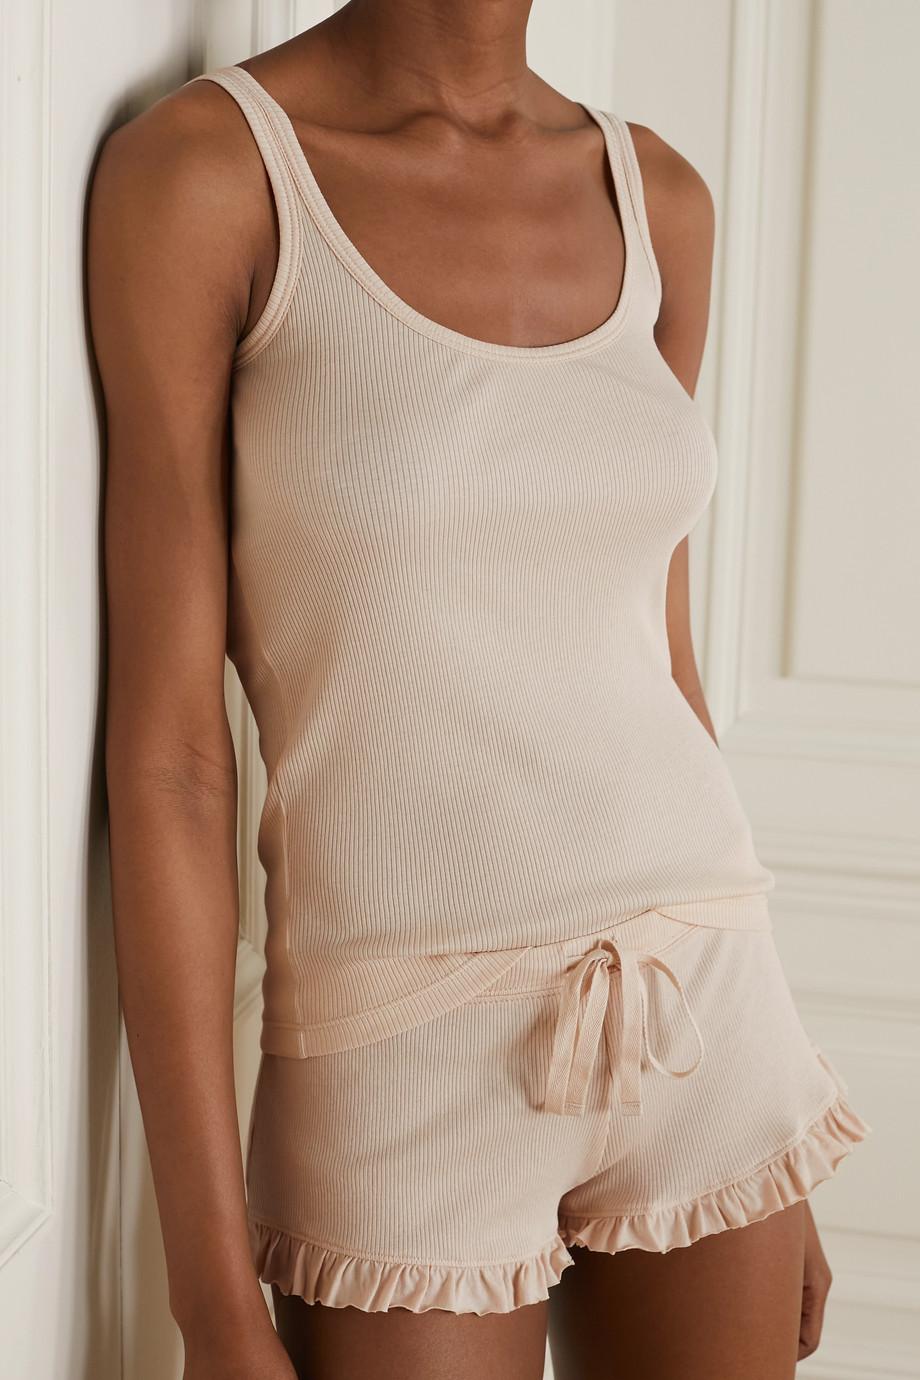 Skin Raise and Raffaela ribbed Pima cotton pajama set